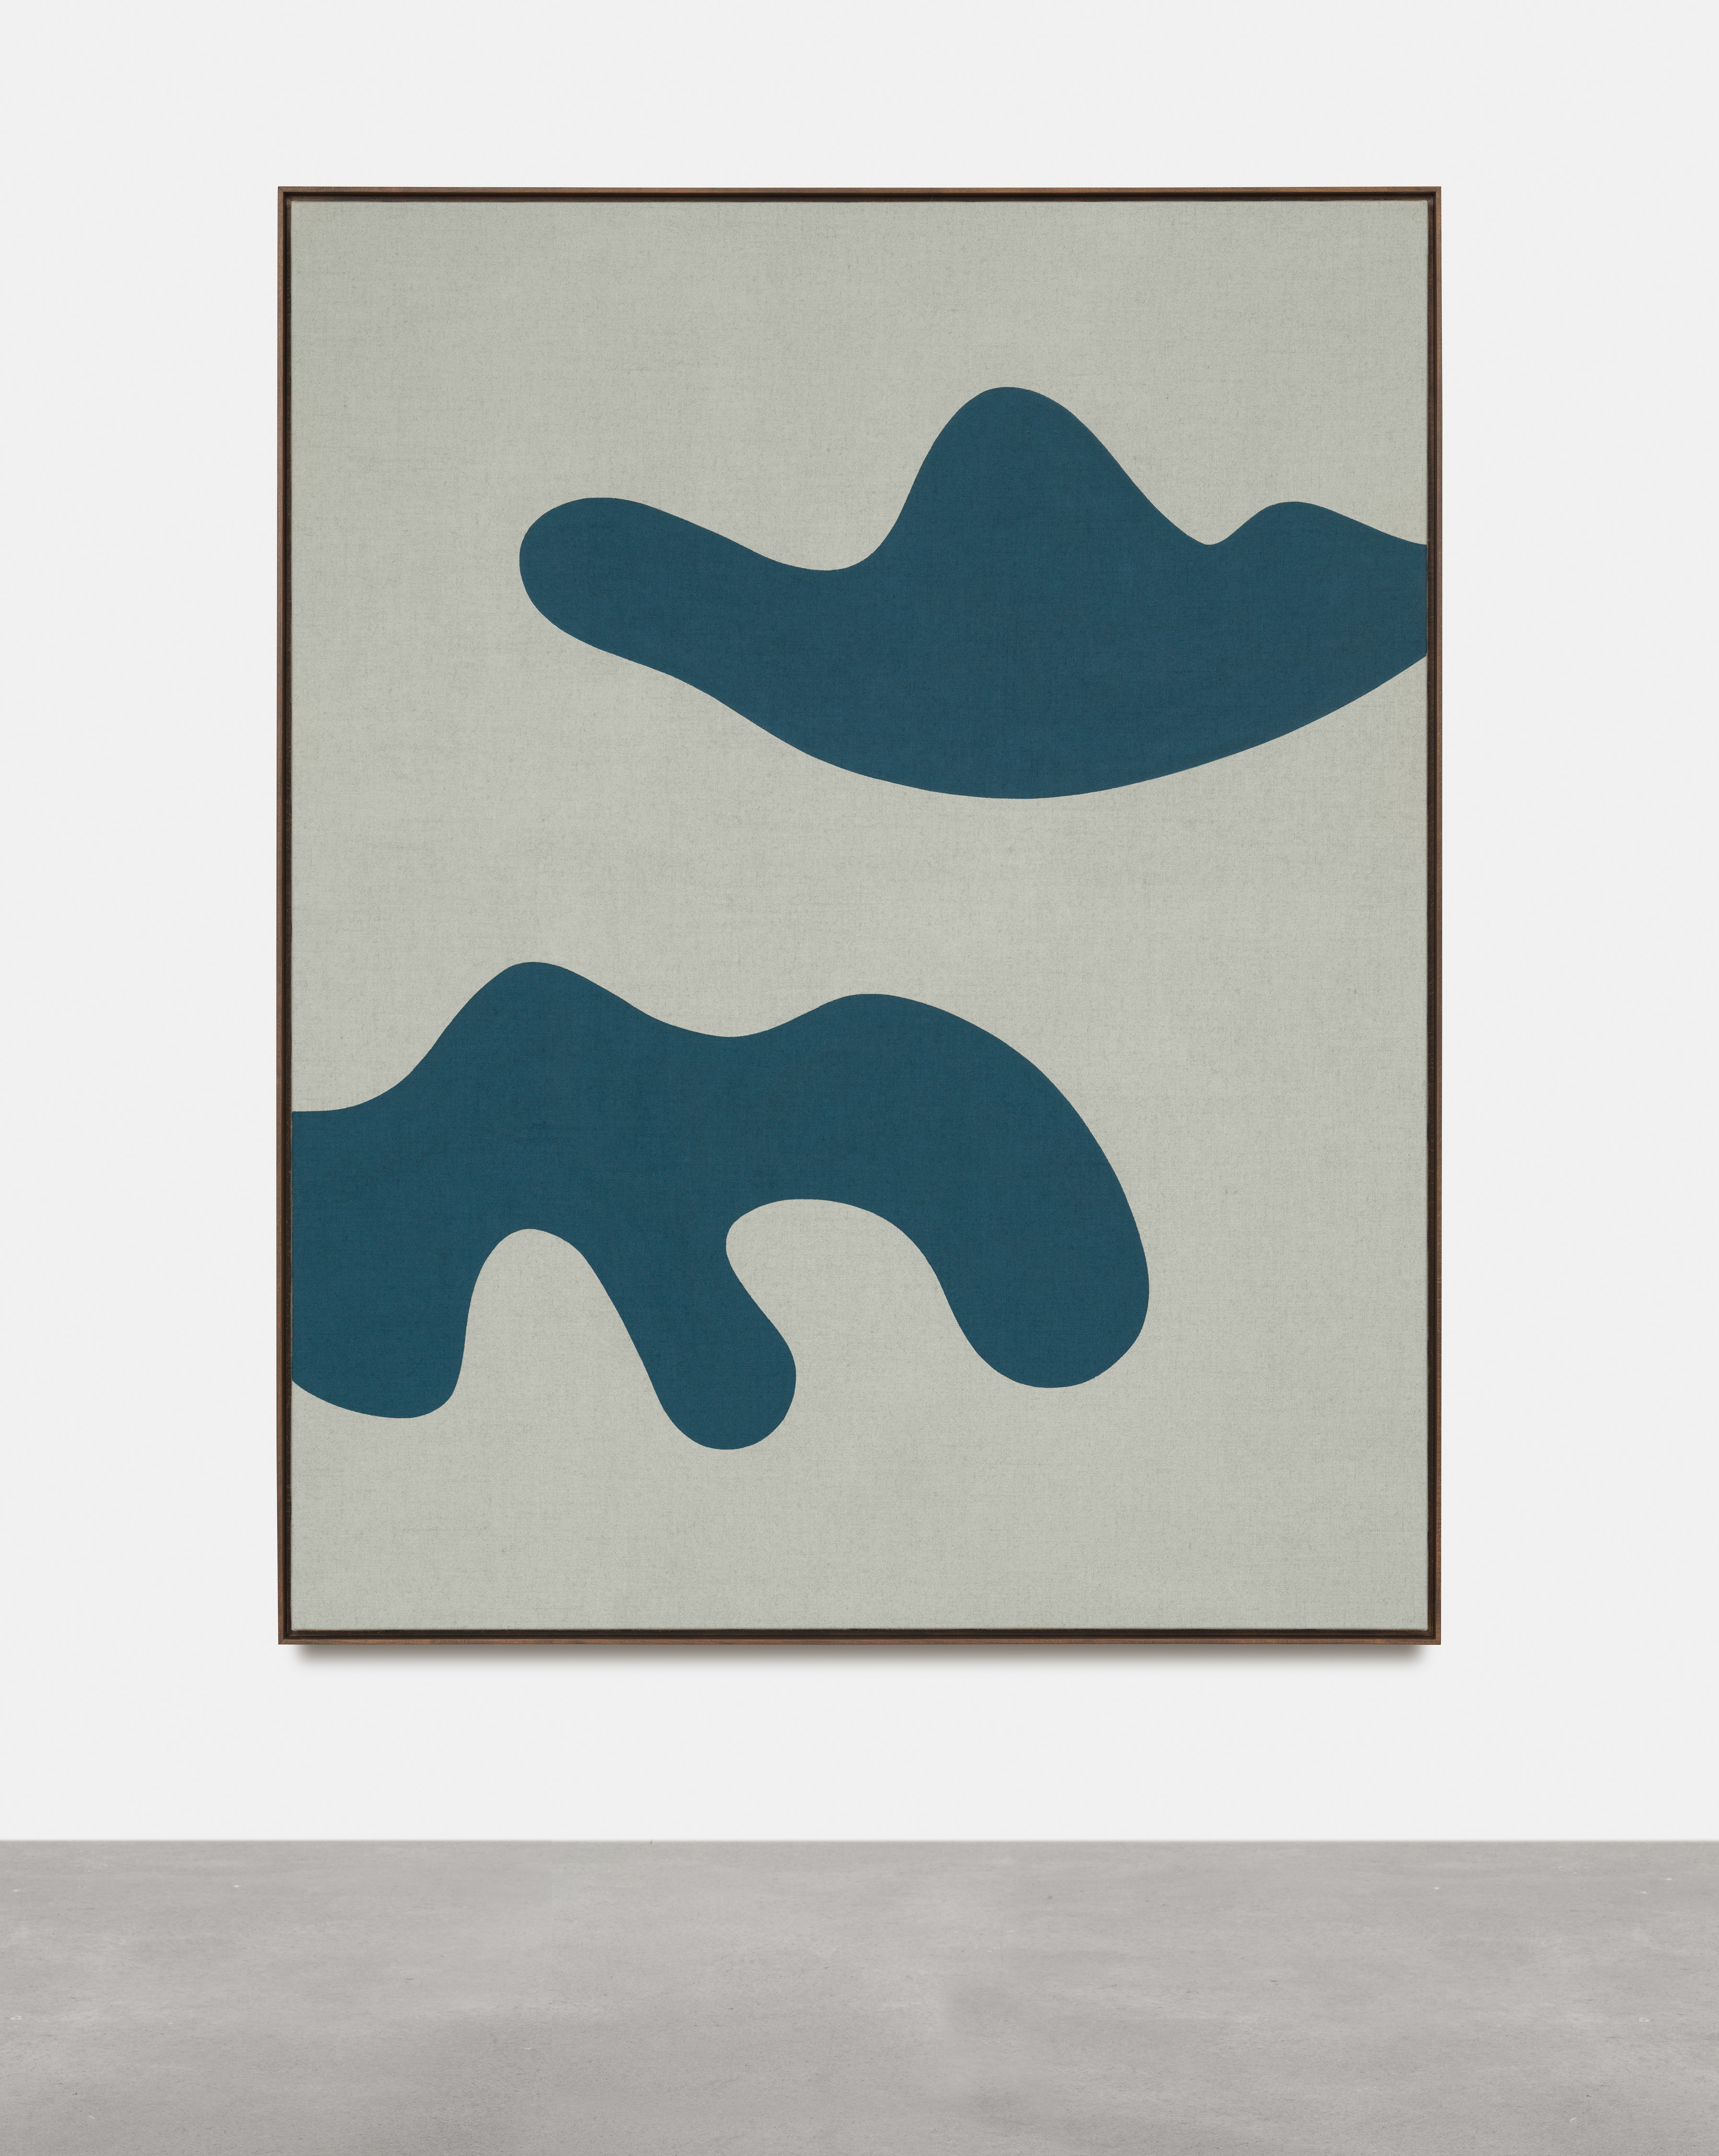 Antonio Ballester Moreno Clouds, 2021 Acrylic on jute 200×158 cm, Unique.